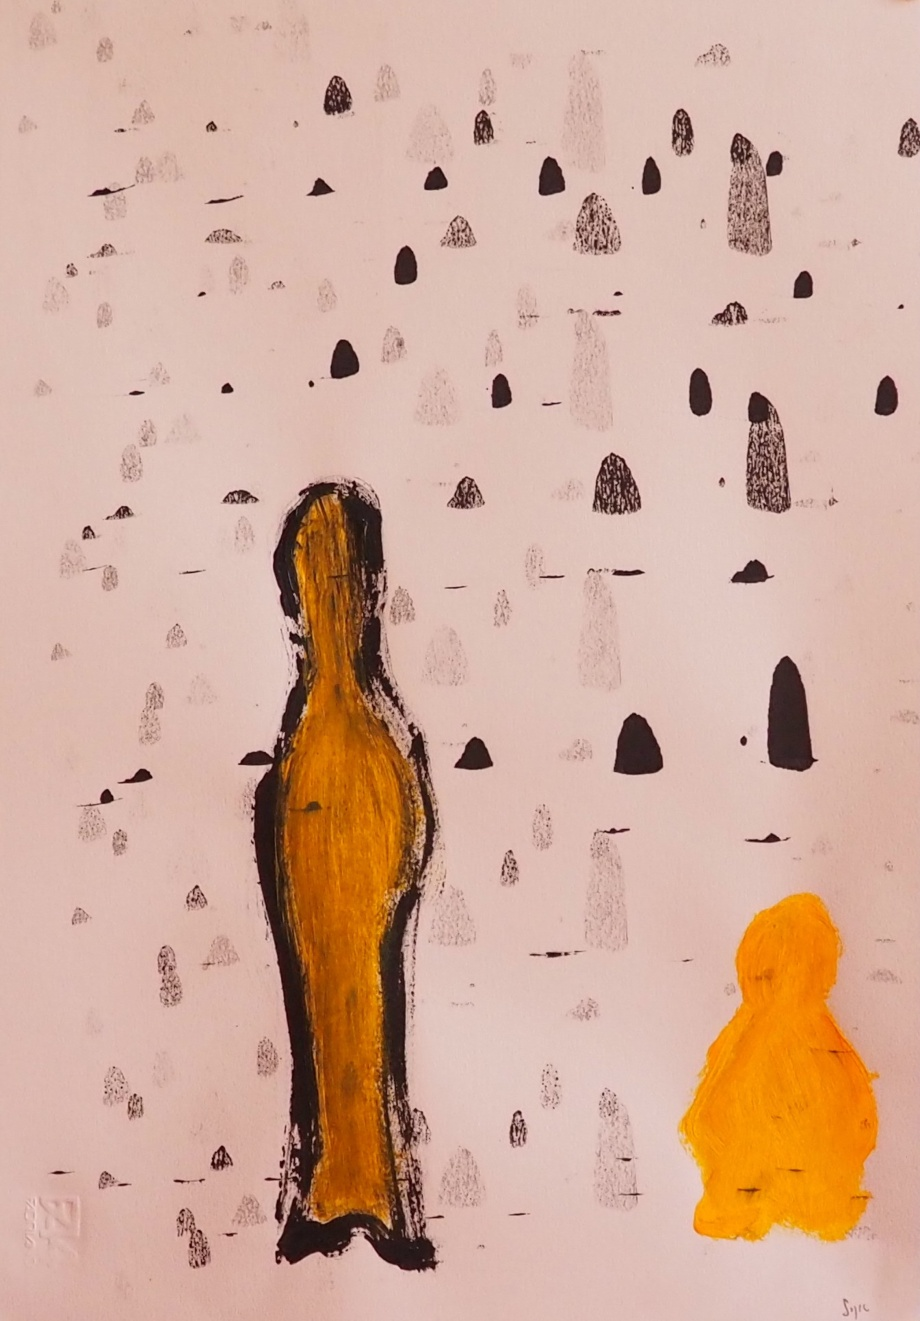 Memes 8, 33 x 48 cm; Gouache on Paper; Sojic, 2018